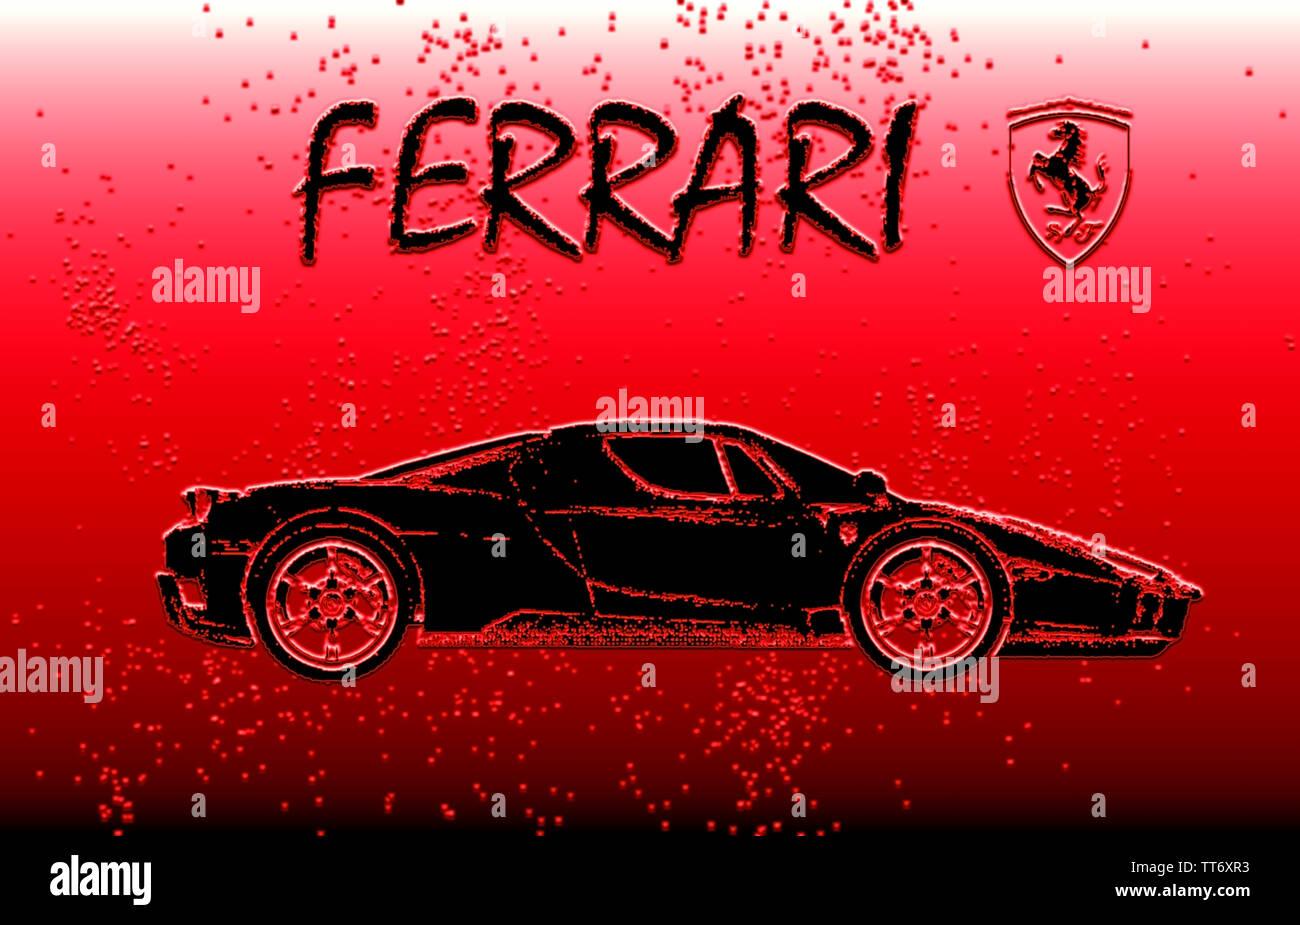 Daiblo Red Black Ferrari Logo Stallion Wallpaper Background Stock Photo Alamy